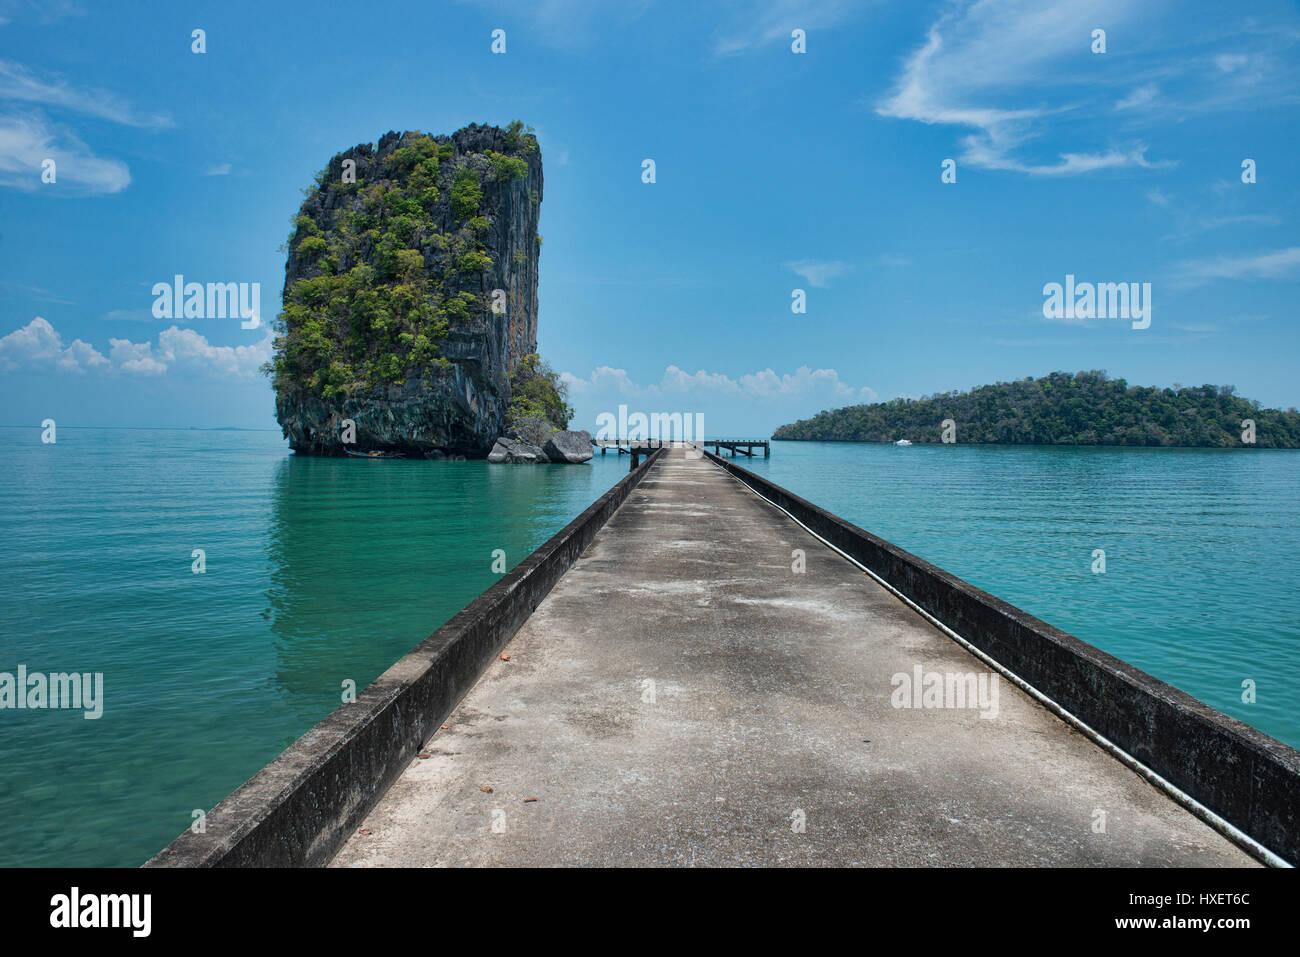 Nail rock and bridge at Ta Lo Wow, Ko Tarutao Island, Thailand - Stock Image